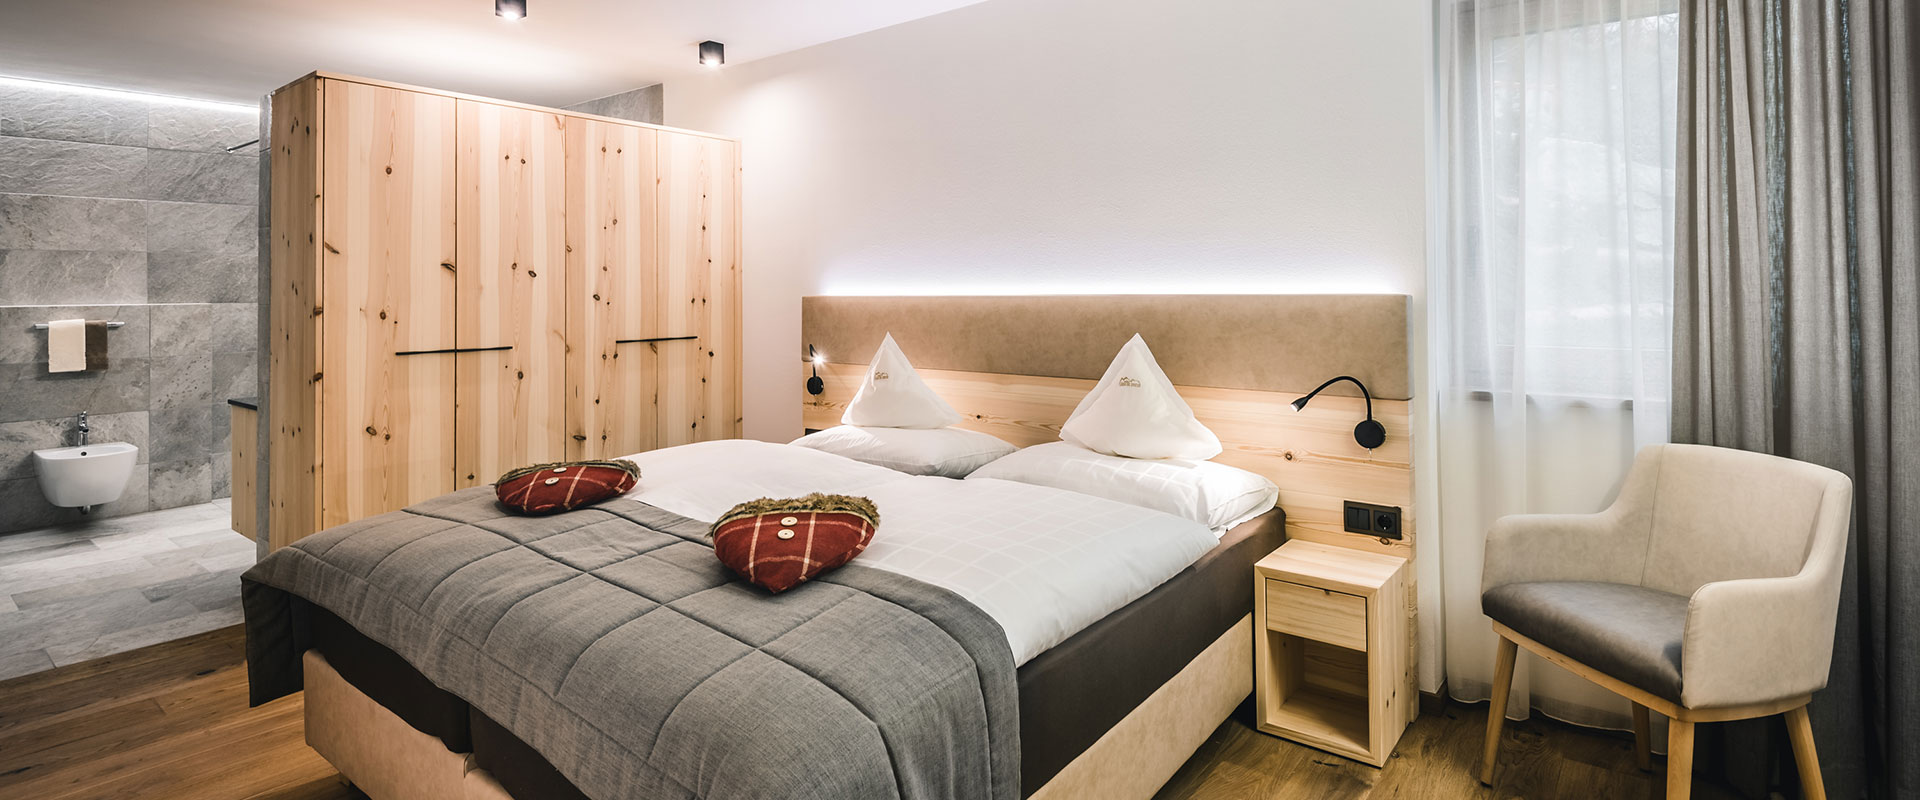 Apartment Barantl Schlafzimmer Colfosco